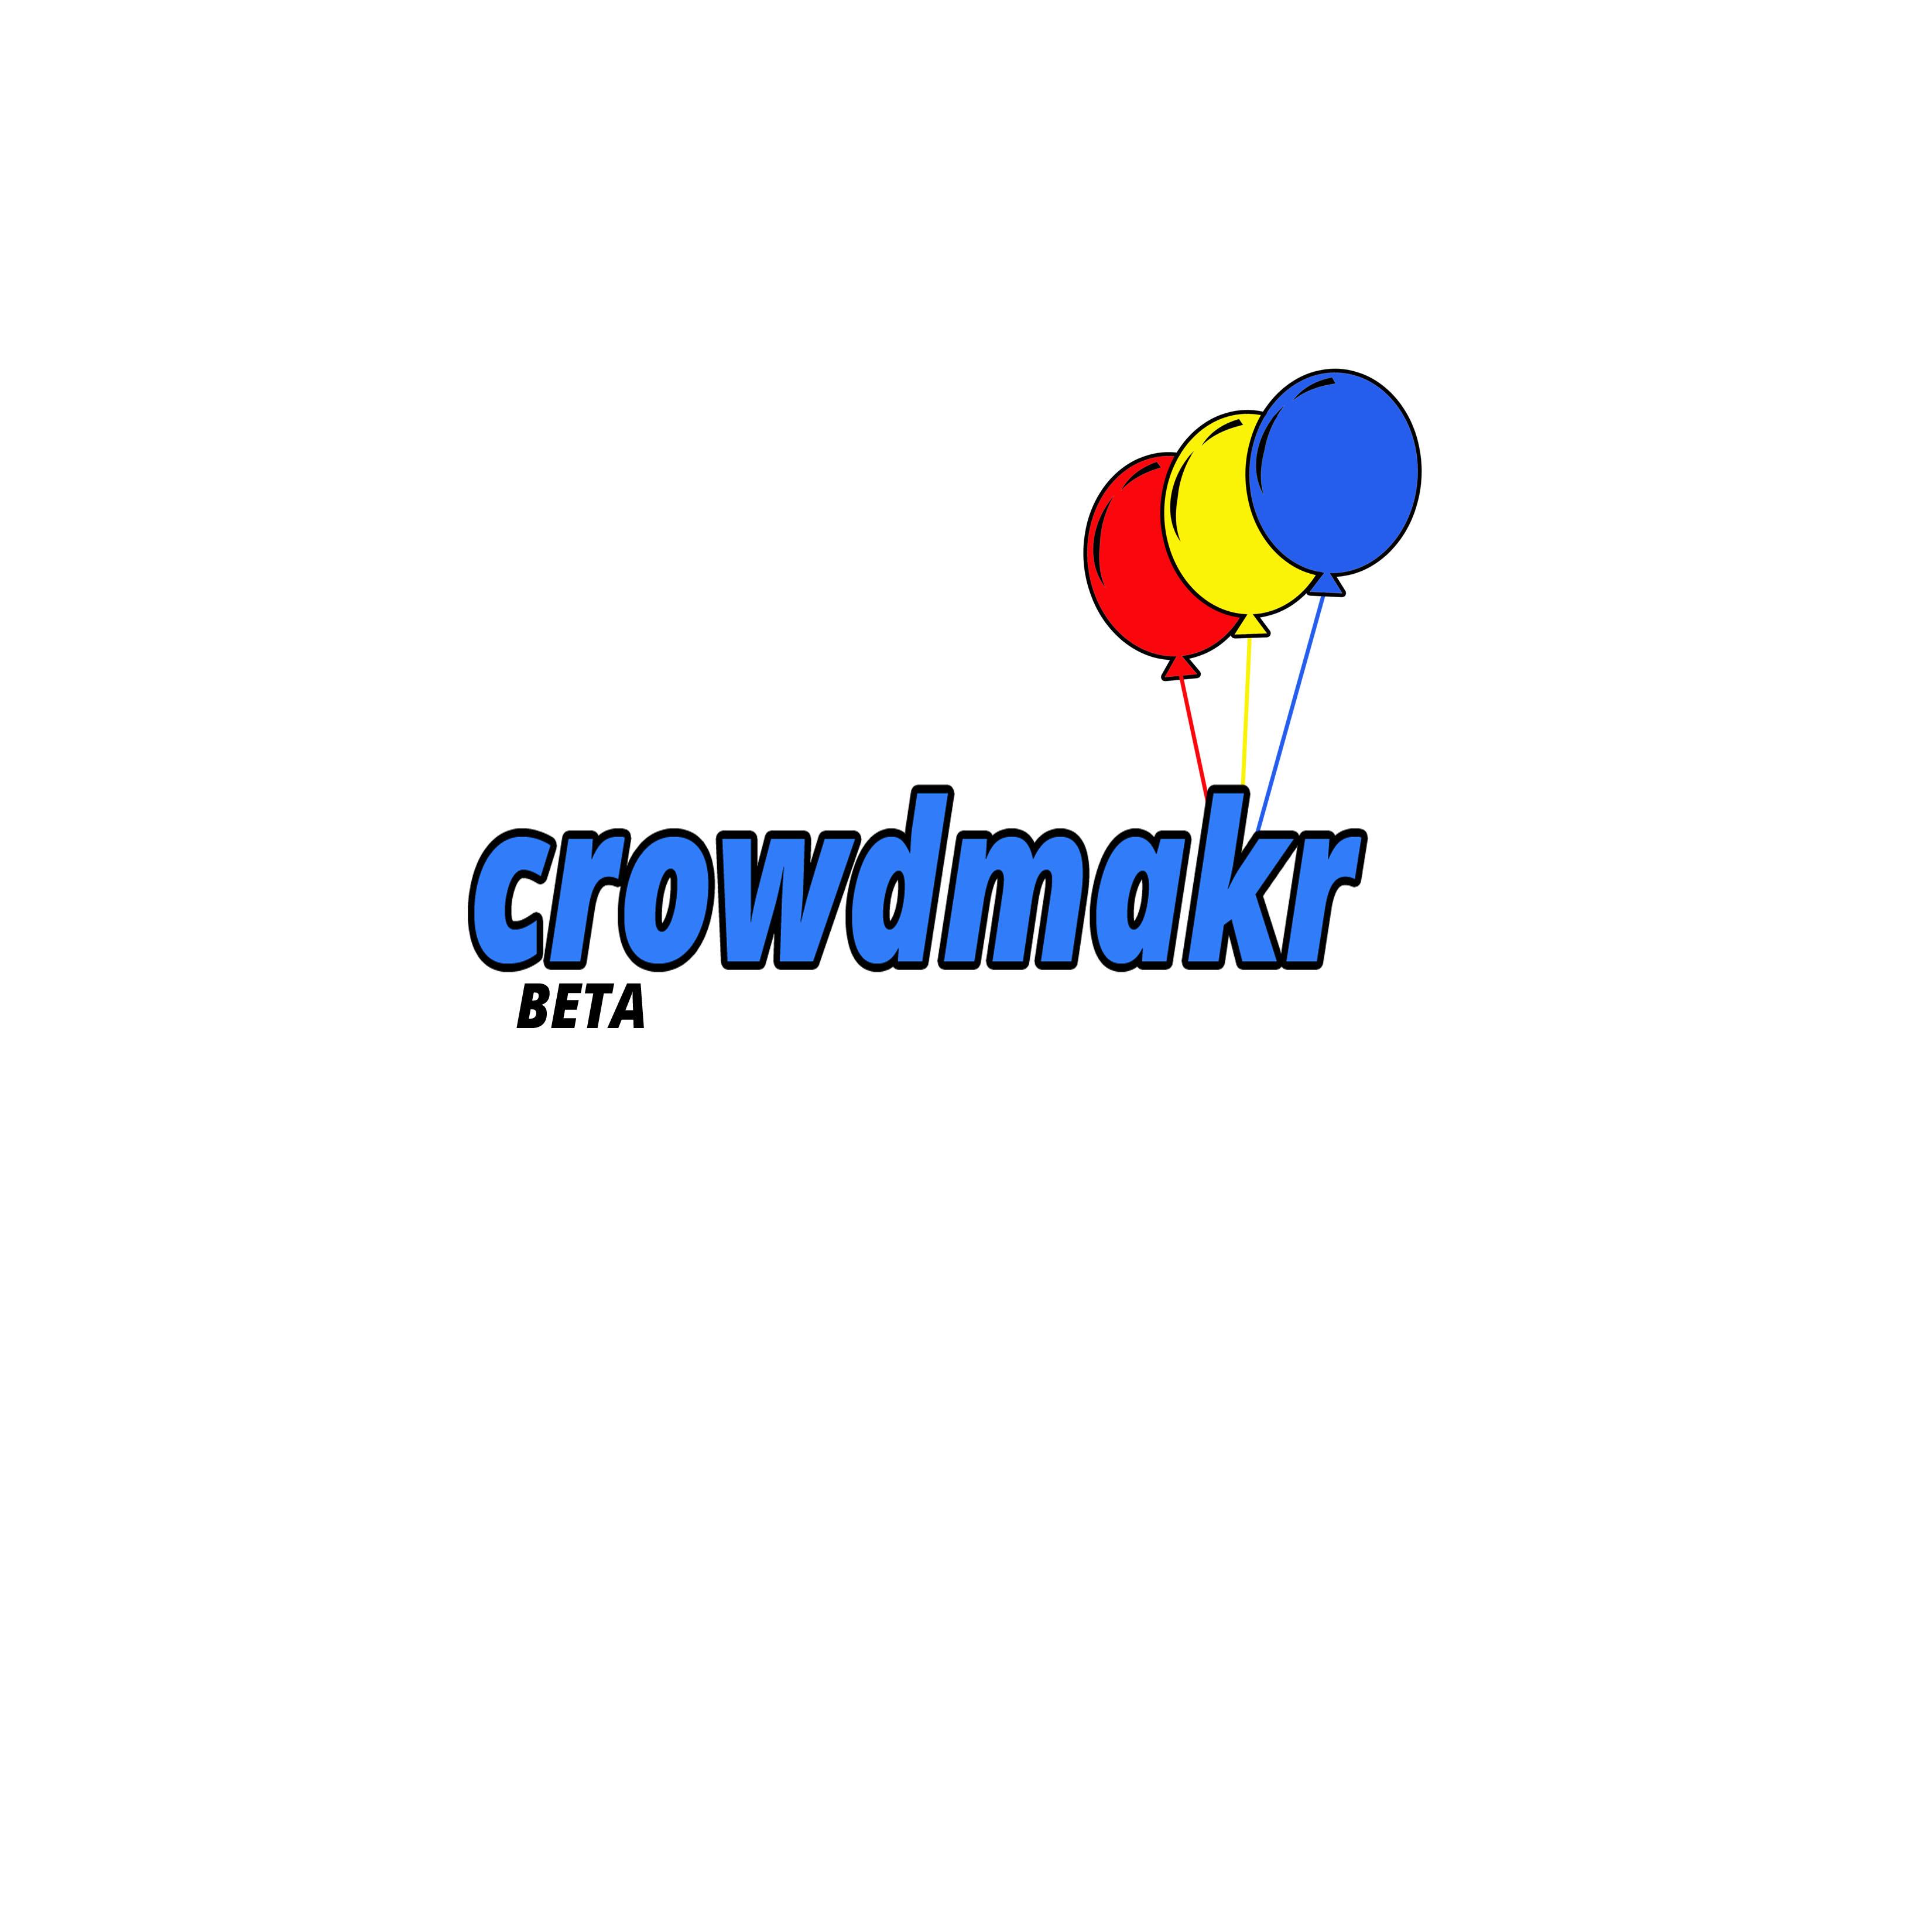 Logo Design by Allan Esclamado - Entry No. 62 in the Logo Design Contest Unique Logo Design Wanted for crowdmakr.